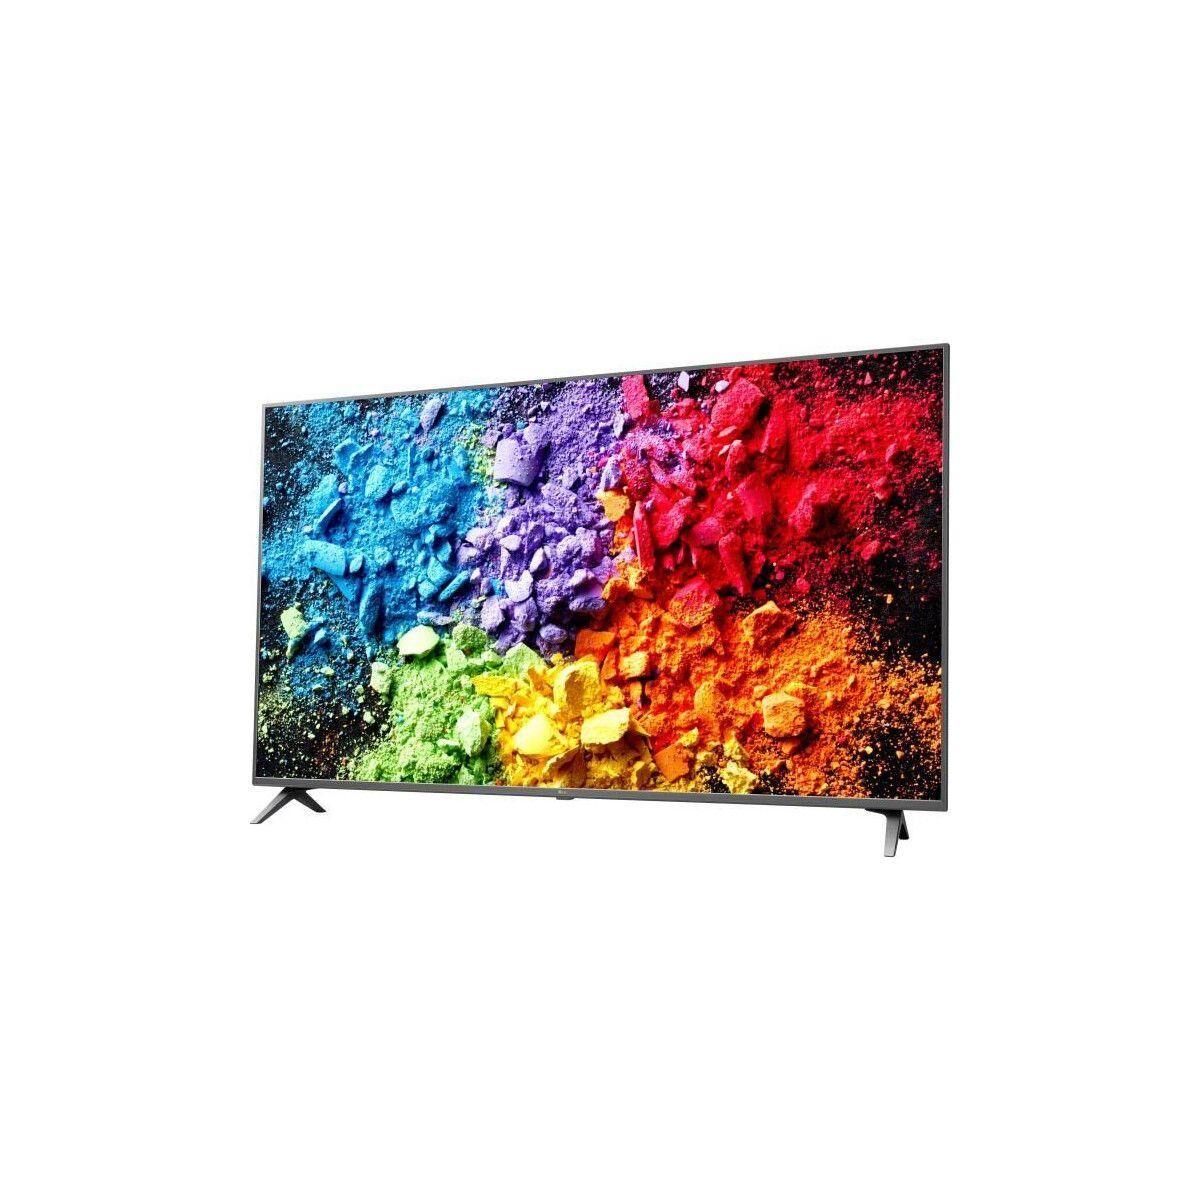 LG 55SK8000 TV LED 4K SUPER UHD NANO CELL Display 139 cm 55 - SMART TV - 4 x HDMI - 3 x USB - Classe energetique A+